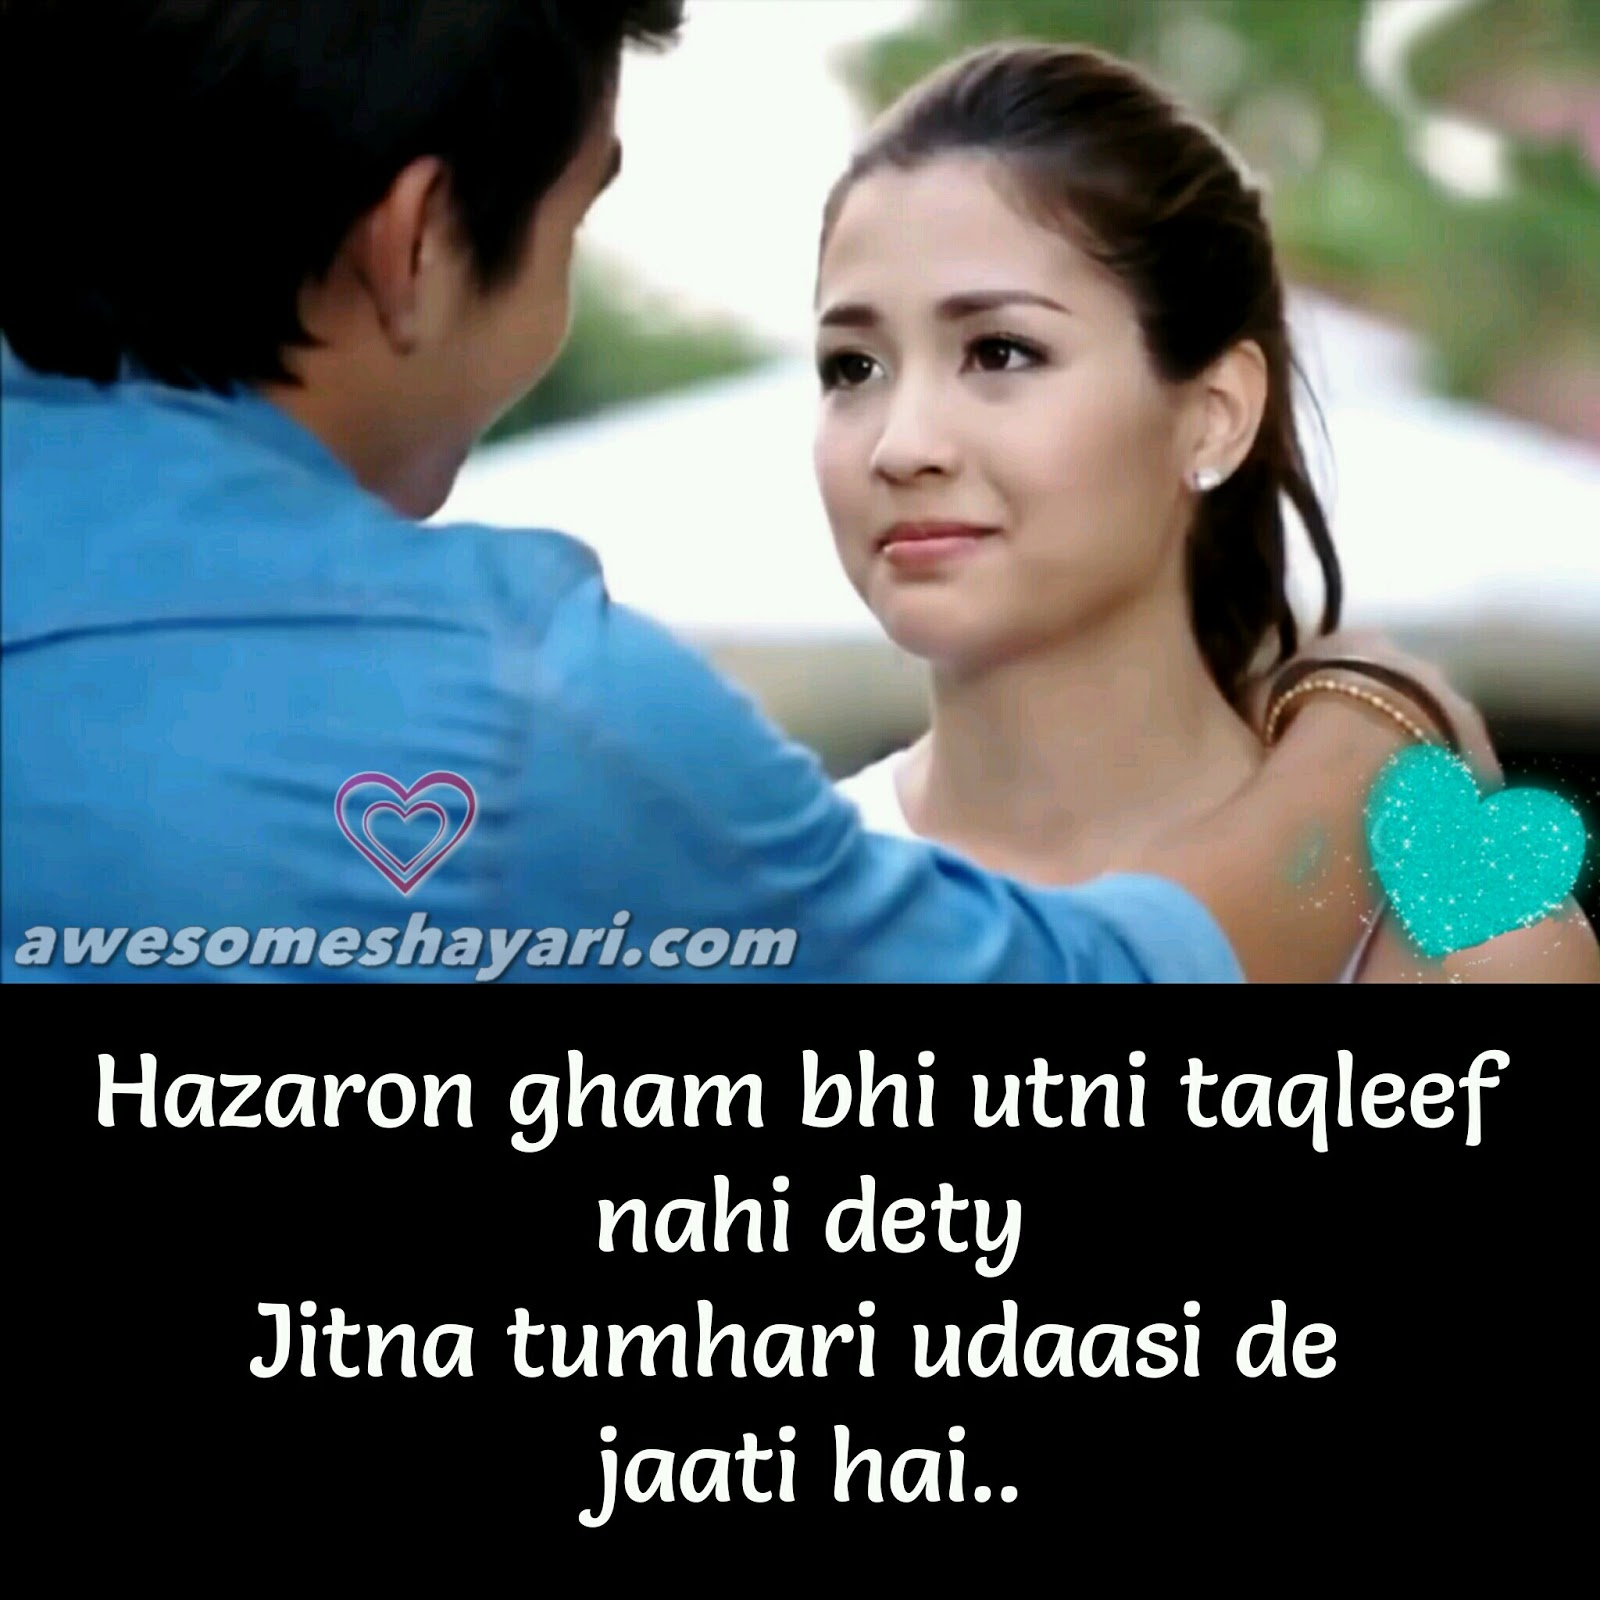 Koi Puche Mere Dil Se Ringtone Downloading: True Love Shayari Images For Facebook & Whatsapp Dp